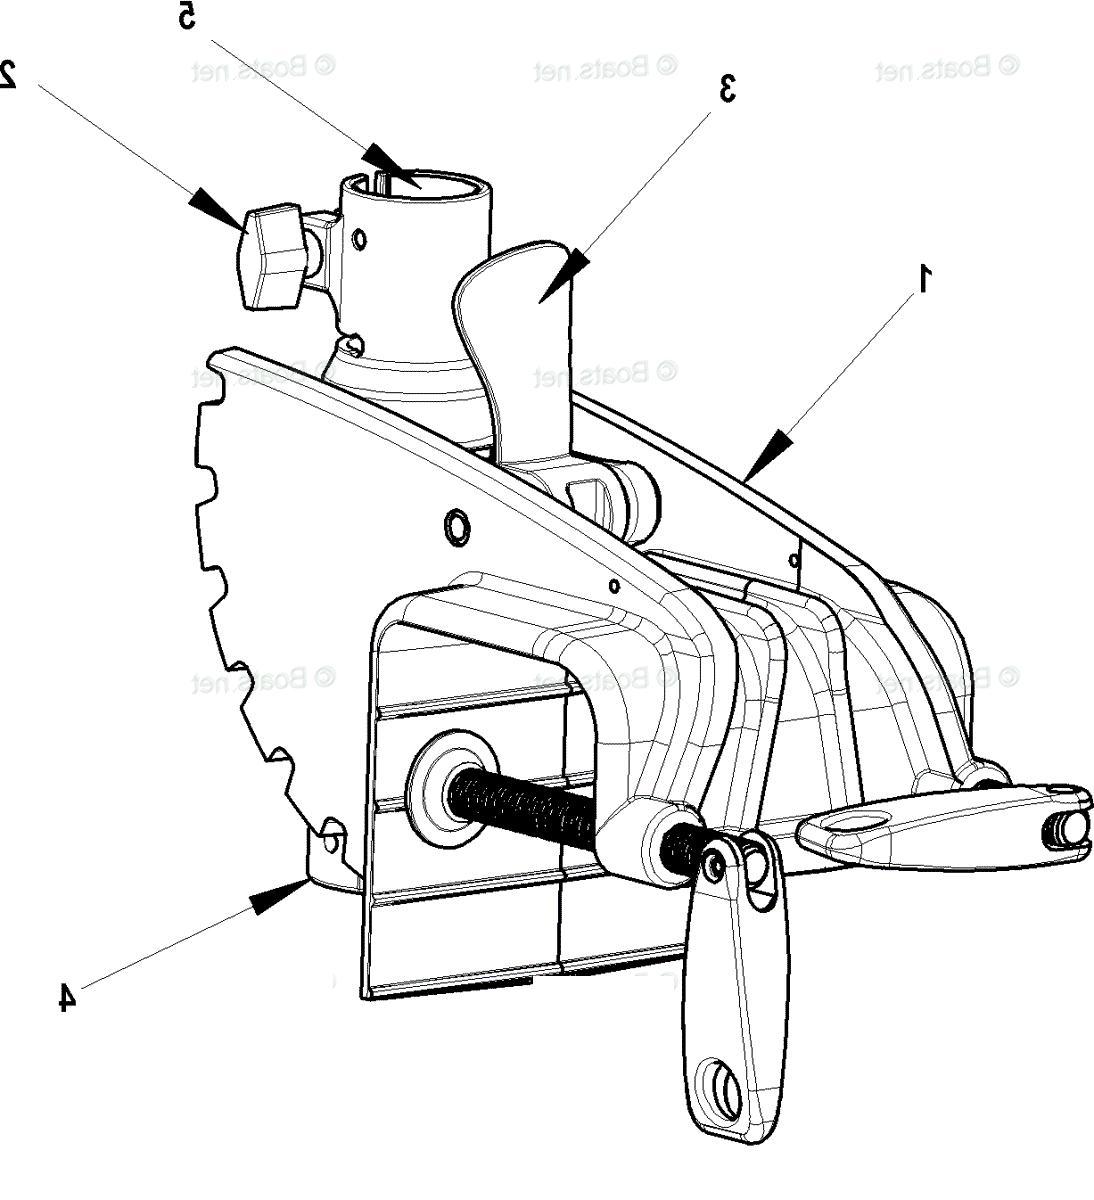 MOTORGUIDE BRACKET TRANSOM 8m0057337